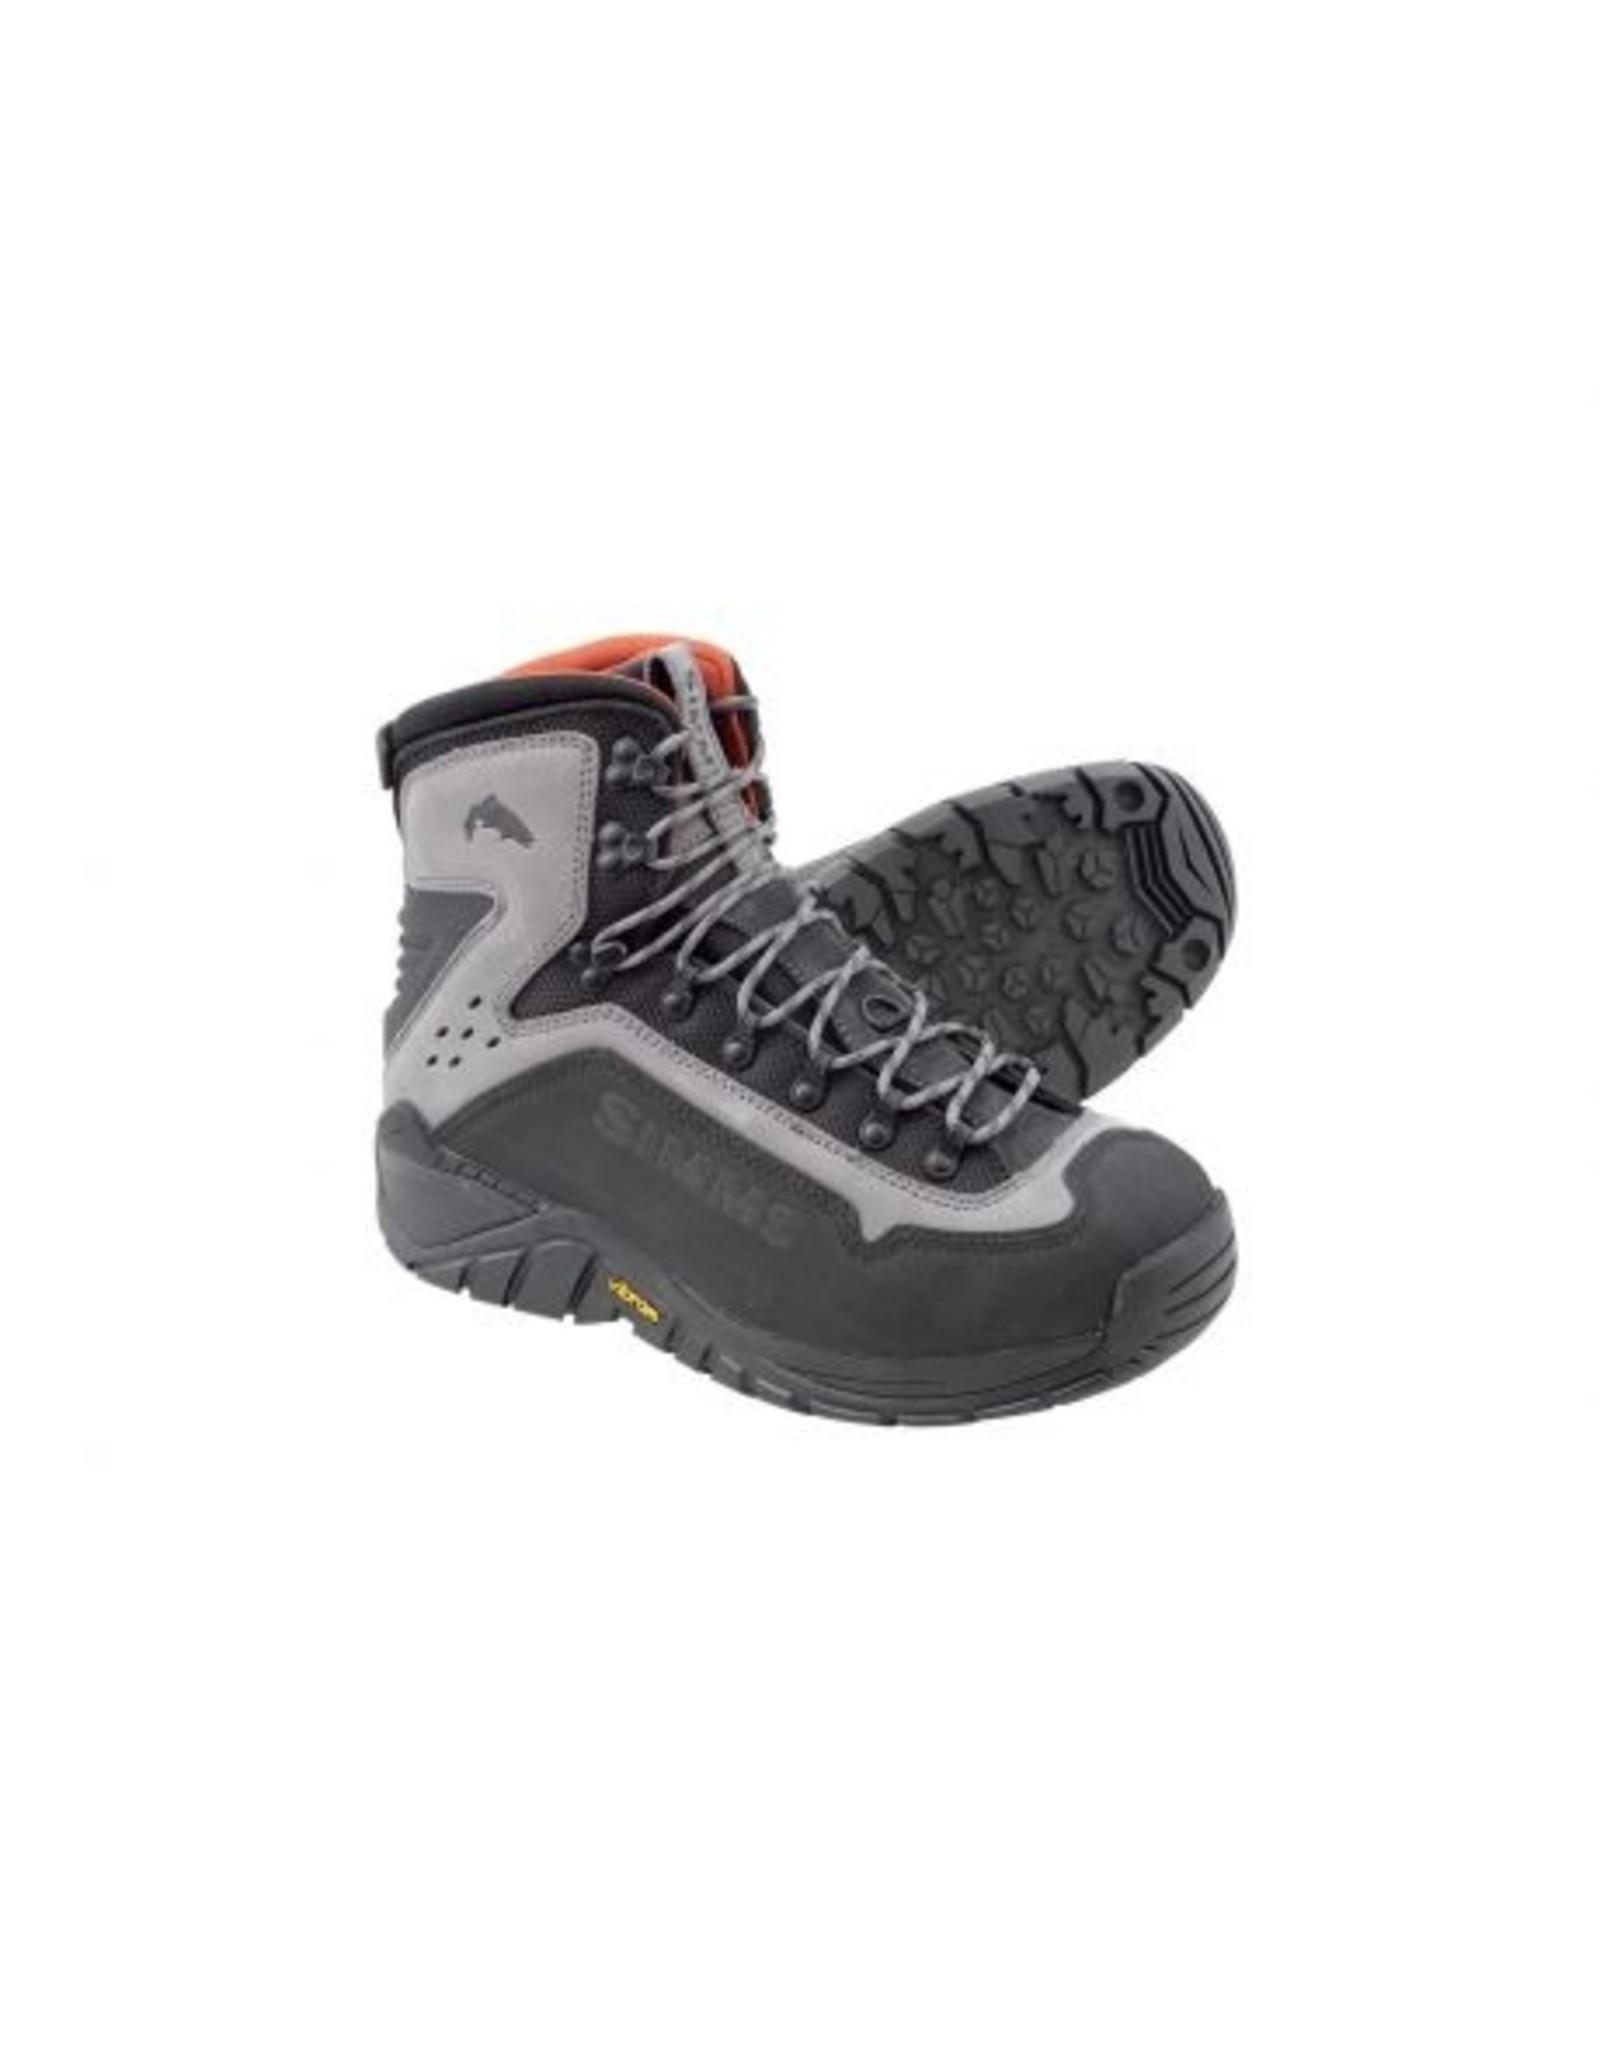 Simms Simms - Men's G3 Guide Wading Boots - Vibram Soles